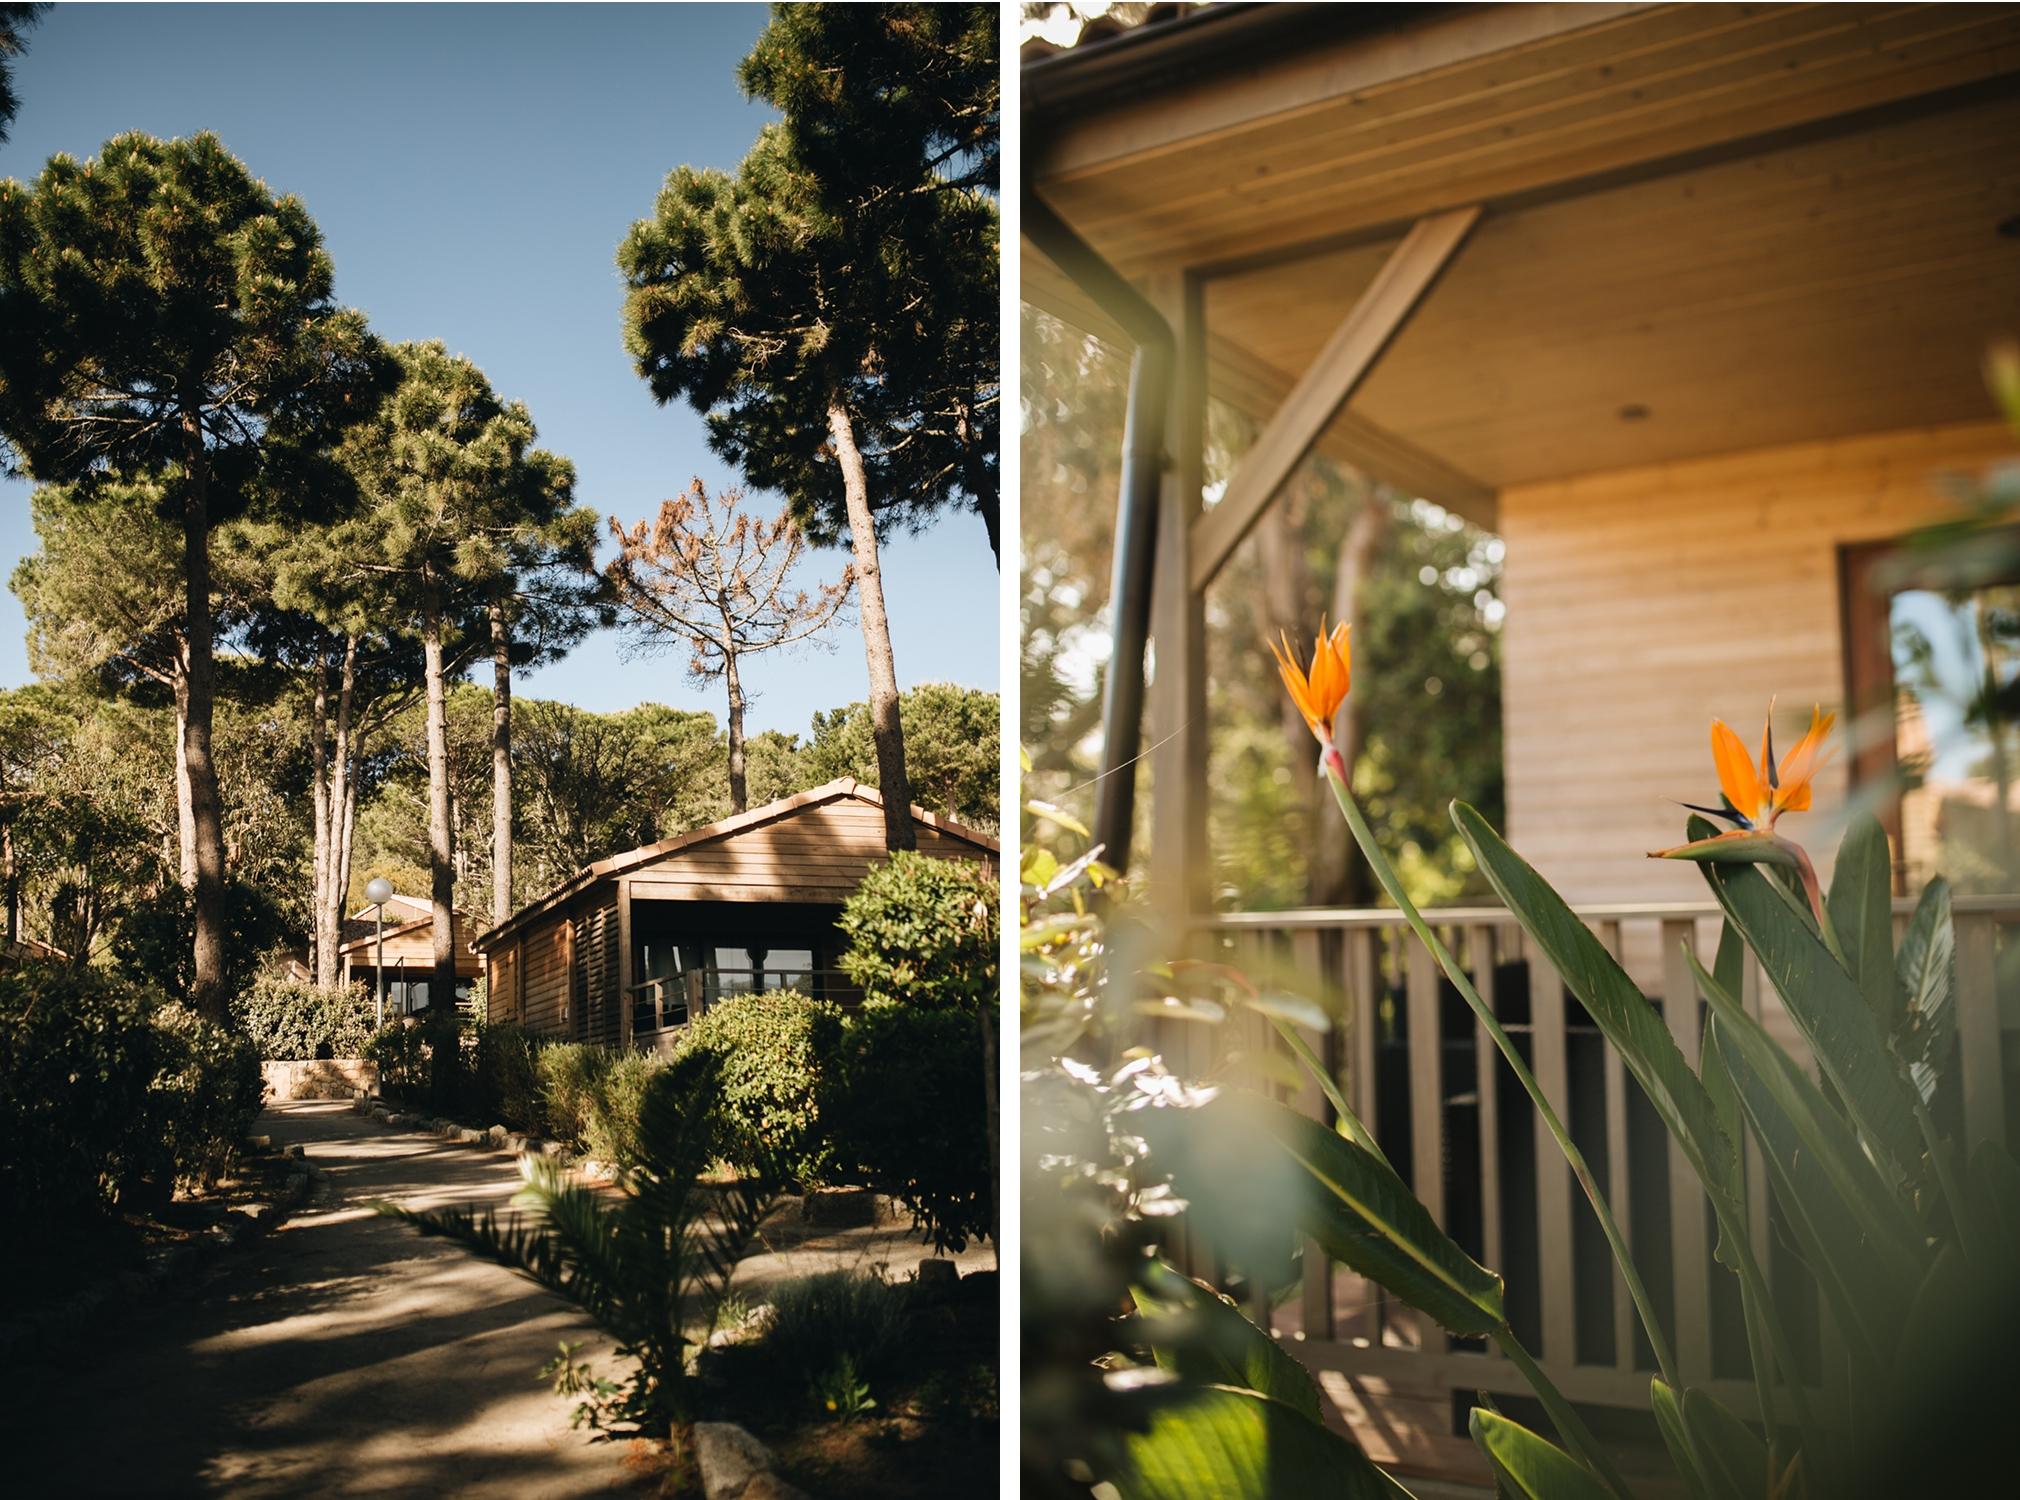 U-Livanti-residence-corse-propriano-campomoro-bonne-adresse.jpg